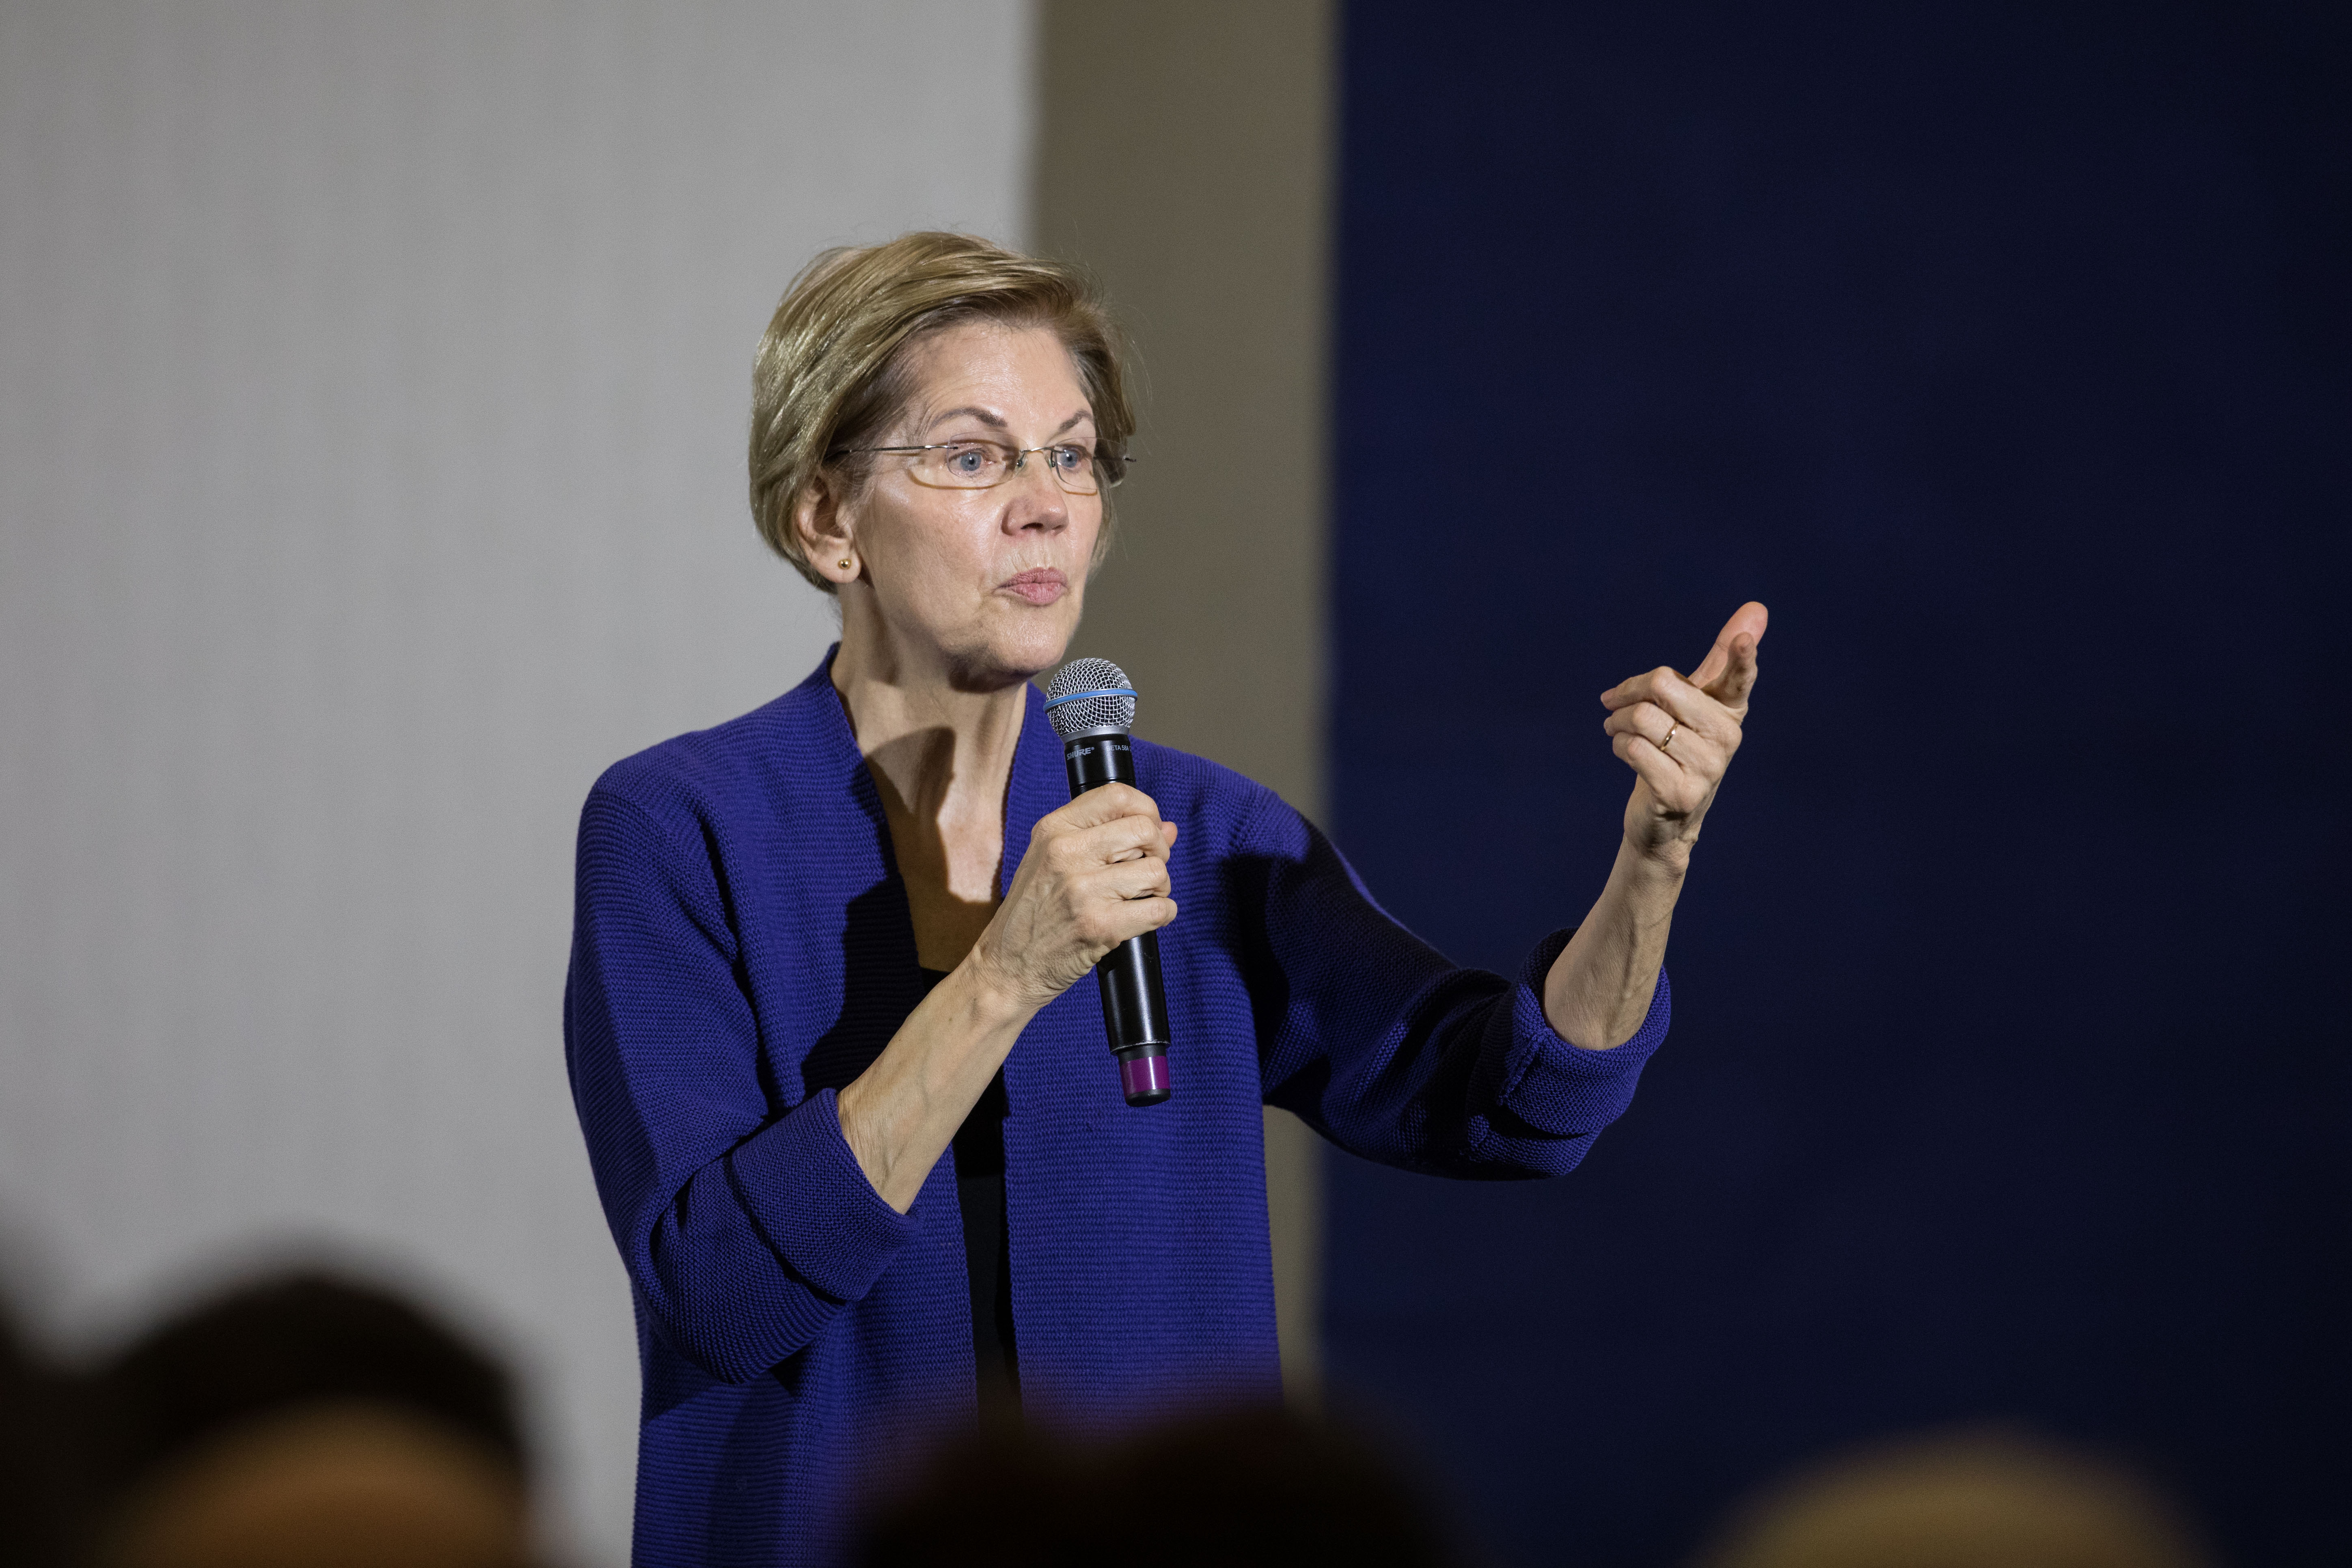 Senator Elizabeth Warren standing and holding a microphone.